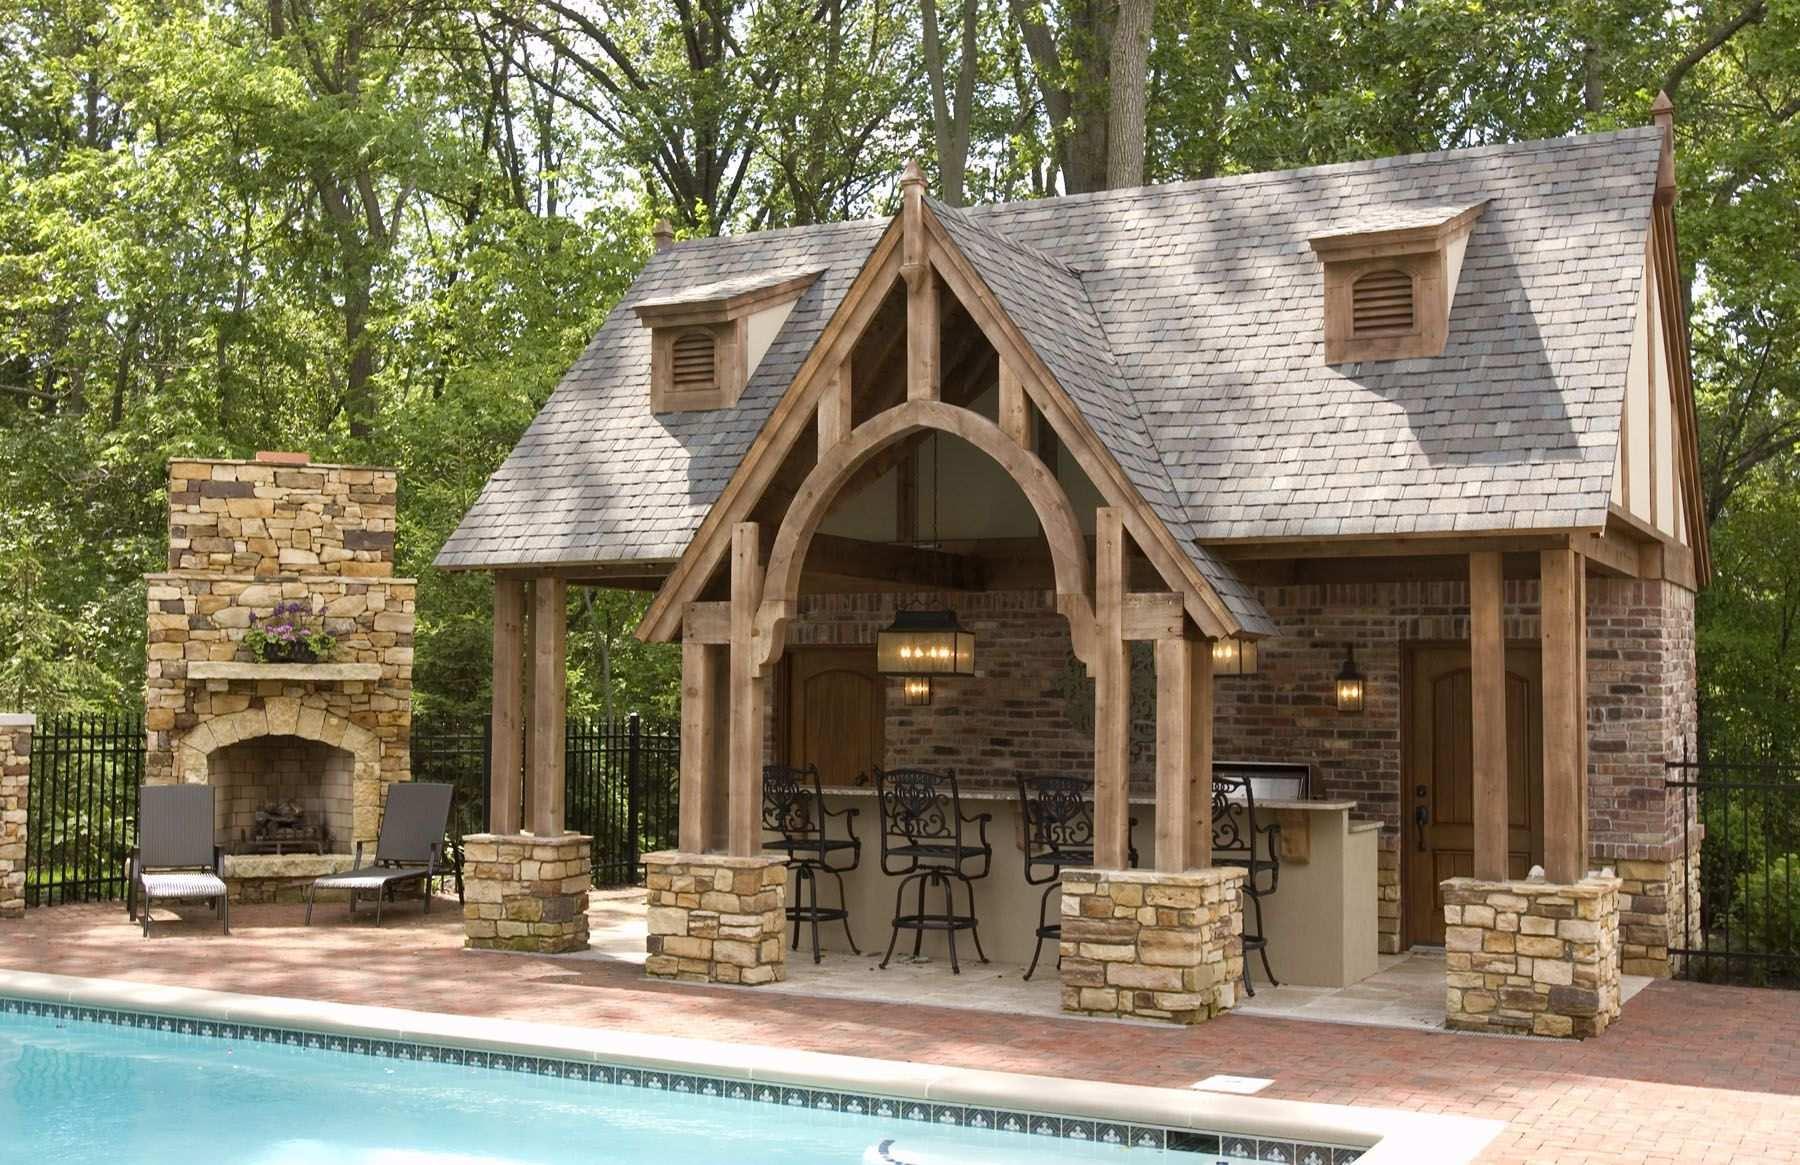 20 Gorgeous Poolside Outdoor Kitchen Designs In 2020 Rustic Outdoor Kitchens Pool House Plans Pool Houses